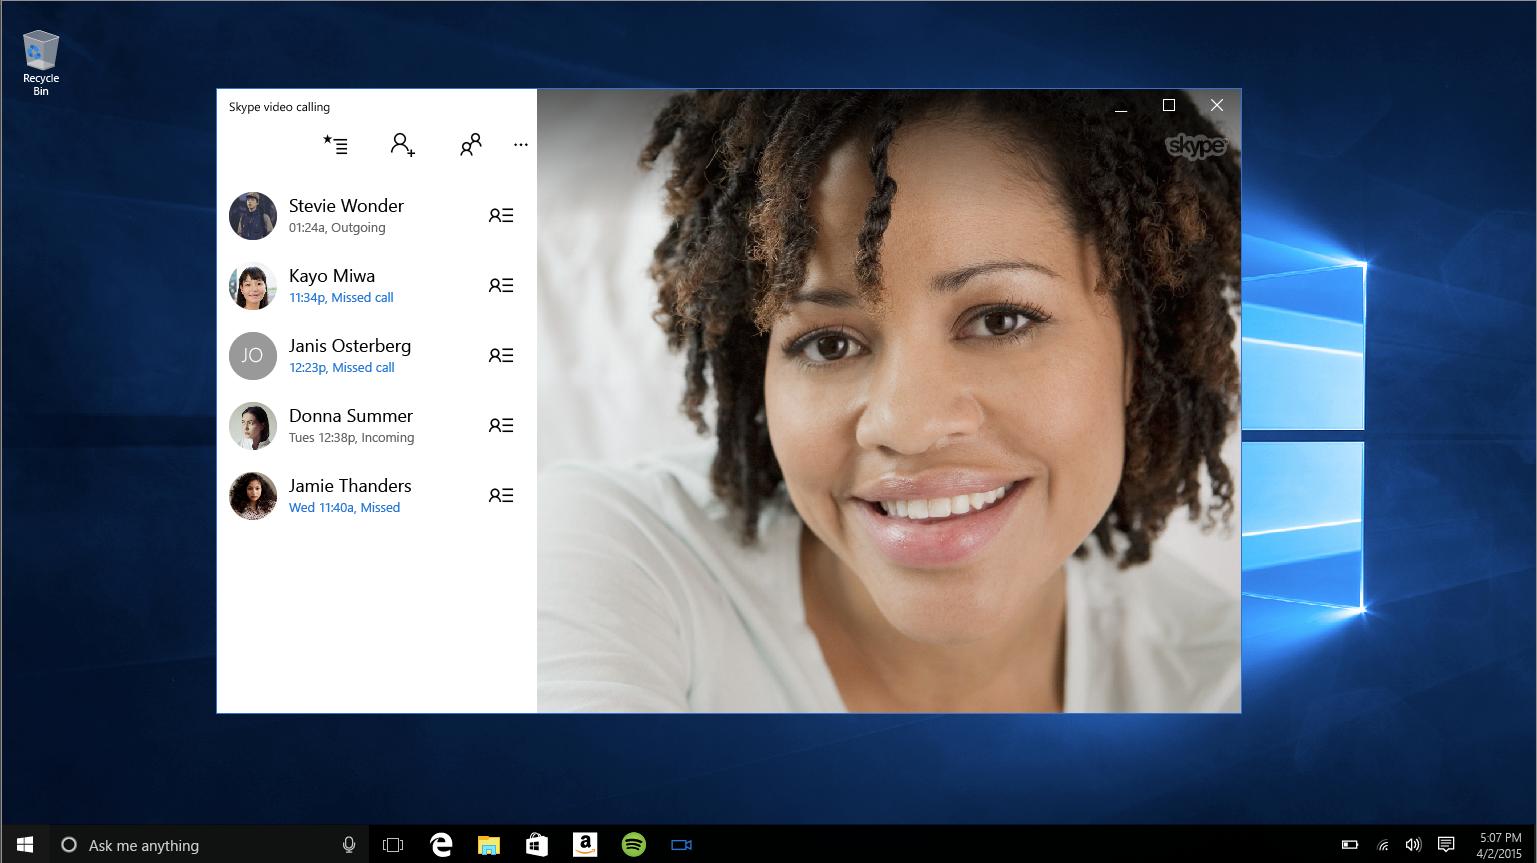 Windows 10 Tracking